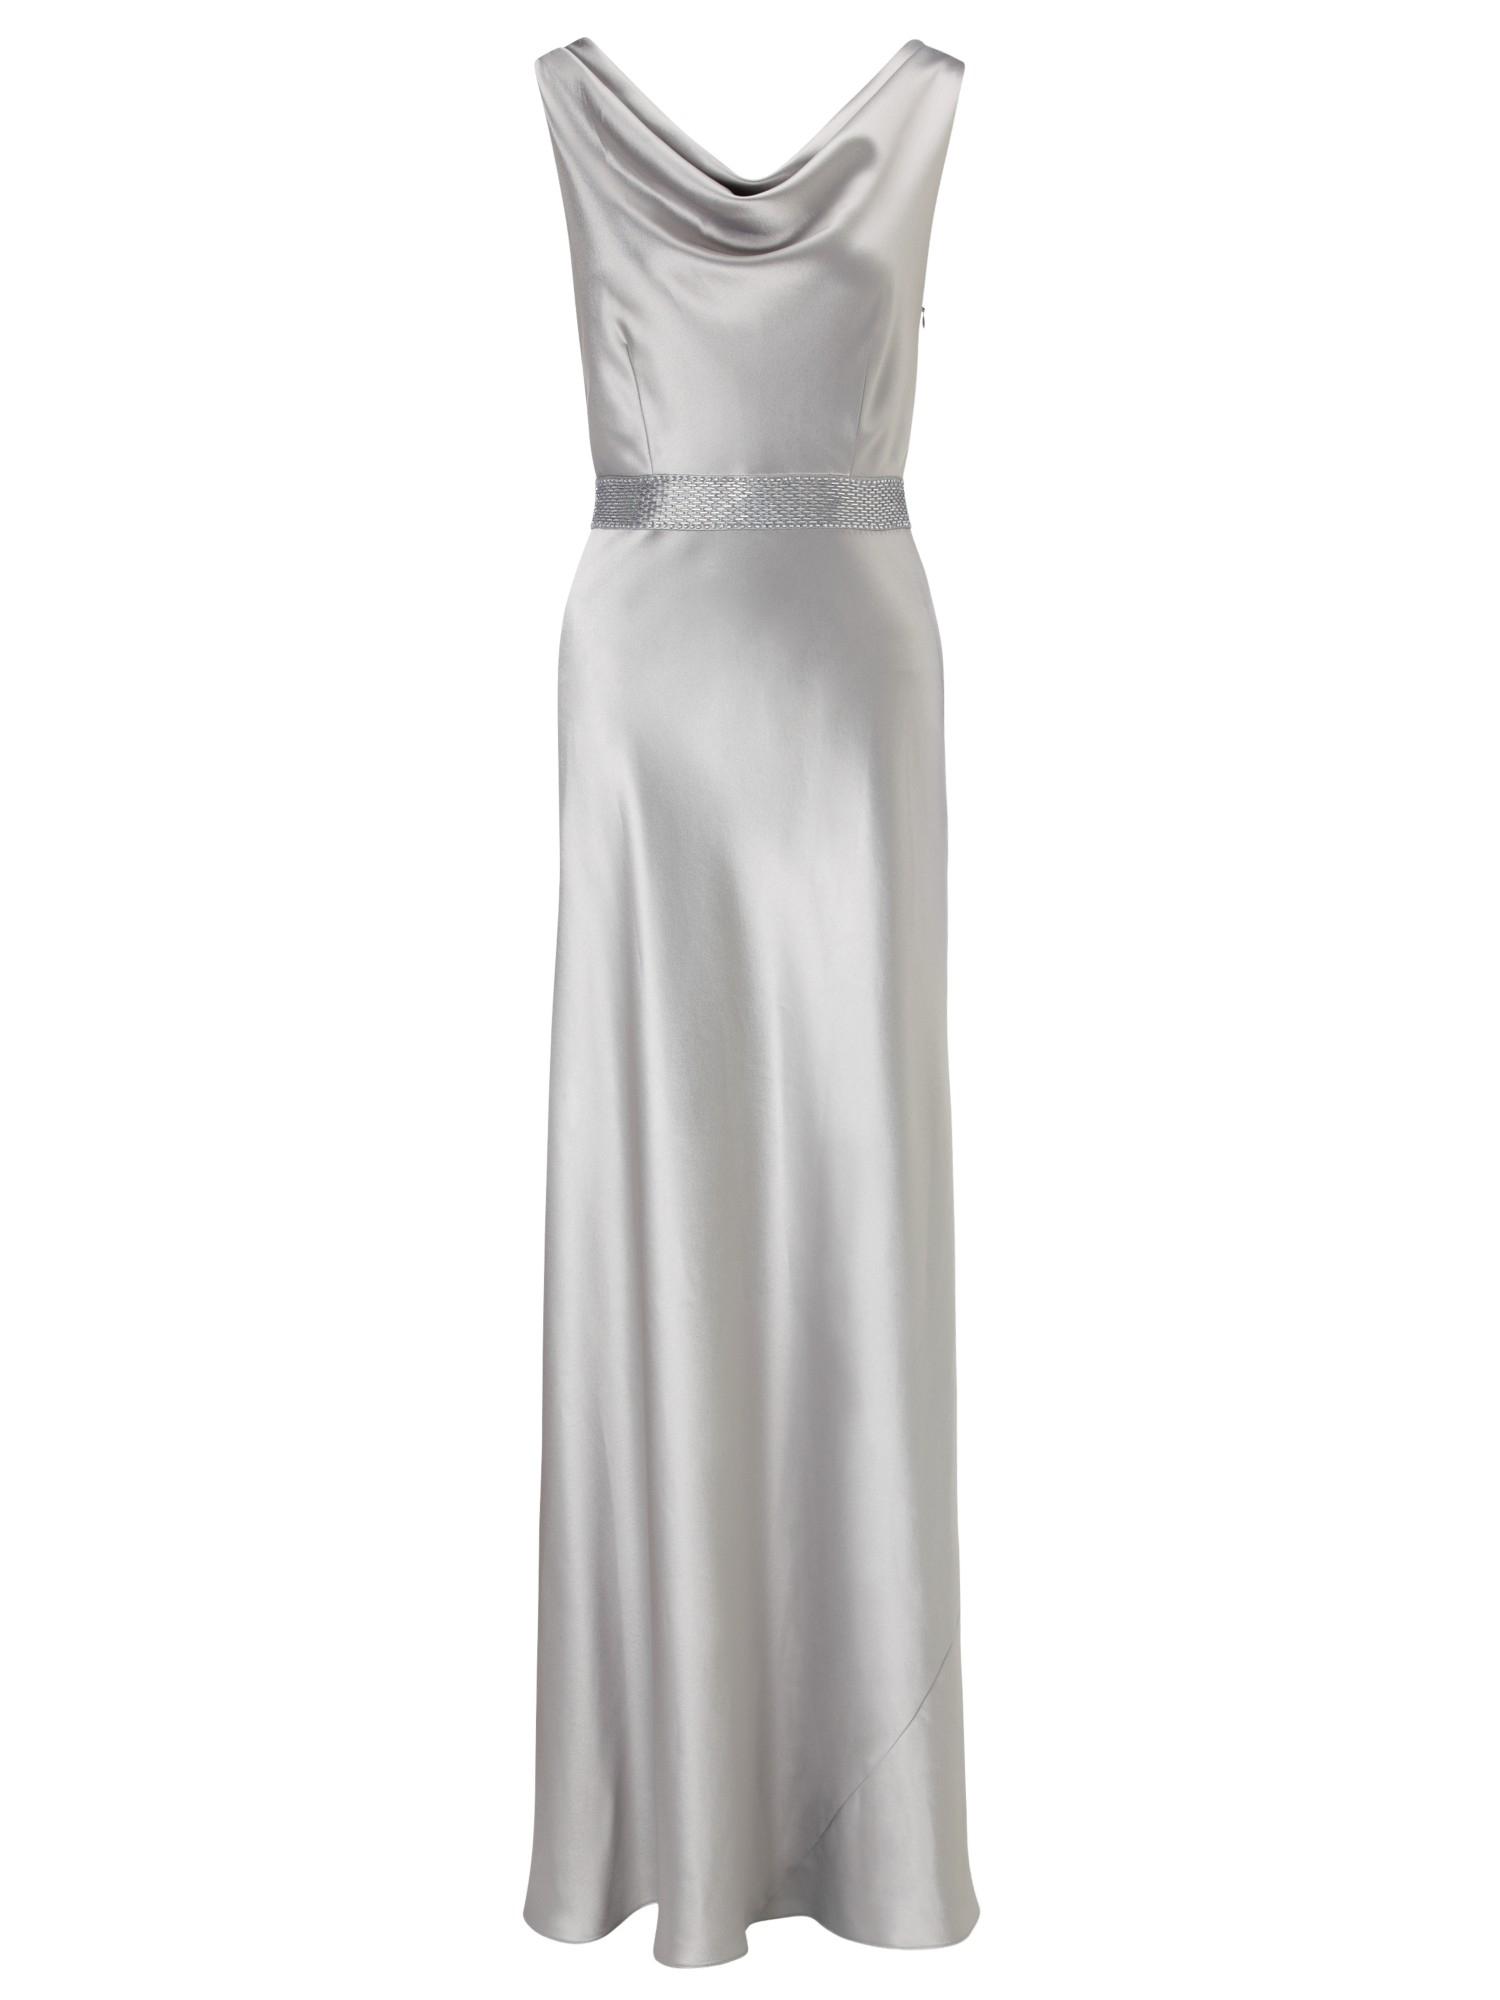 john lewis gray dessa dress product 1 27284895 3 527880913 normal wedding day gifts john lewis wedding gifts,John Lewis Wedding Invitations Personalised